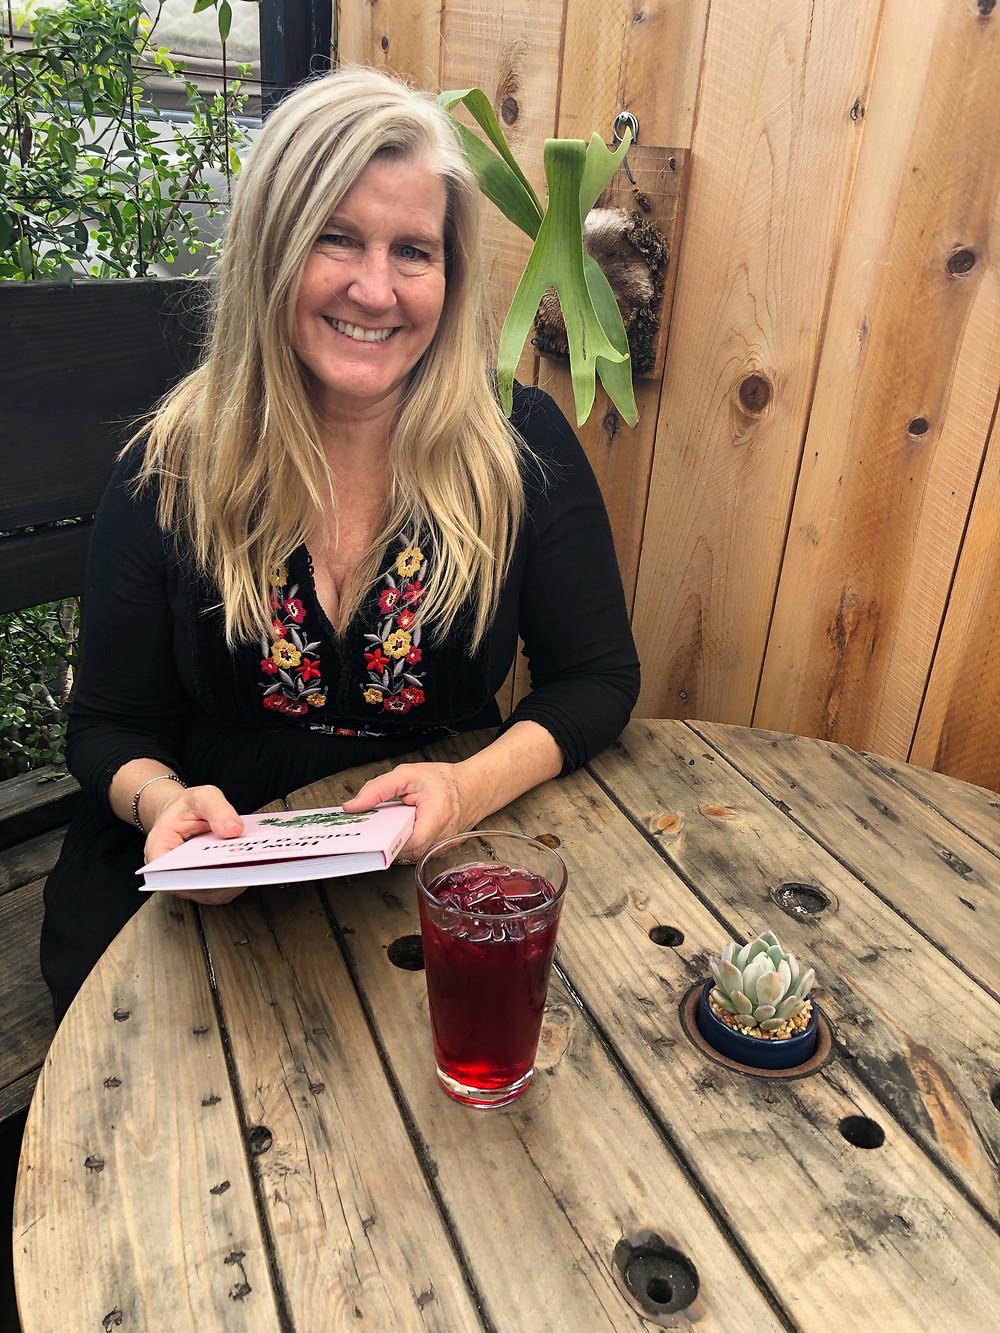 Siri Kay Jostad of Wander Away with Siri Kay sitting on the patio at OB Beans Coffee Roasters in Ocean Beach San Diego California